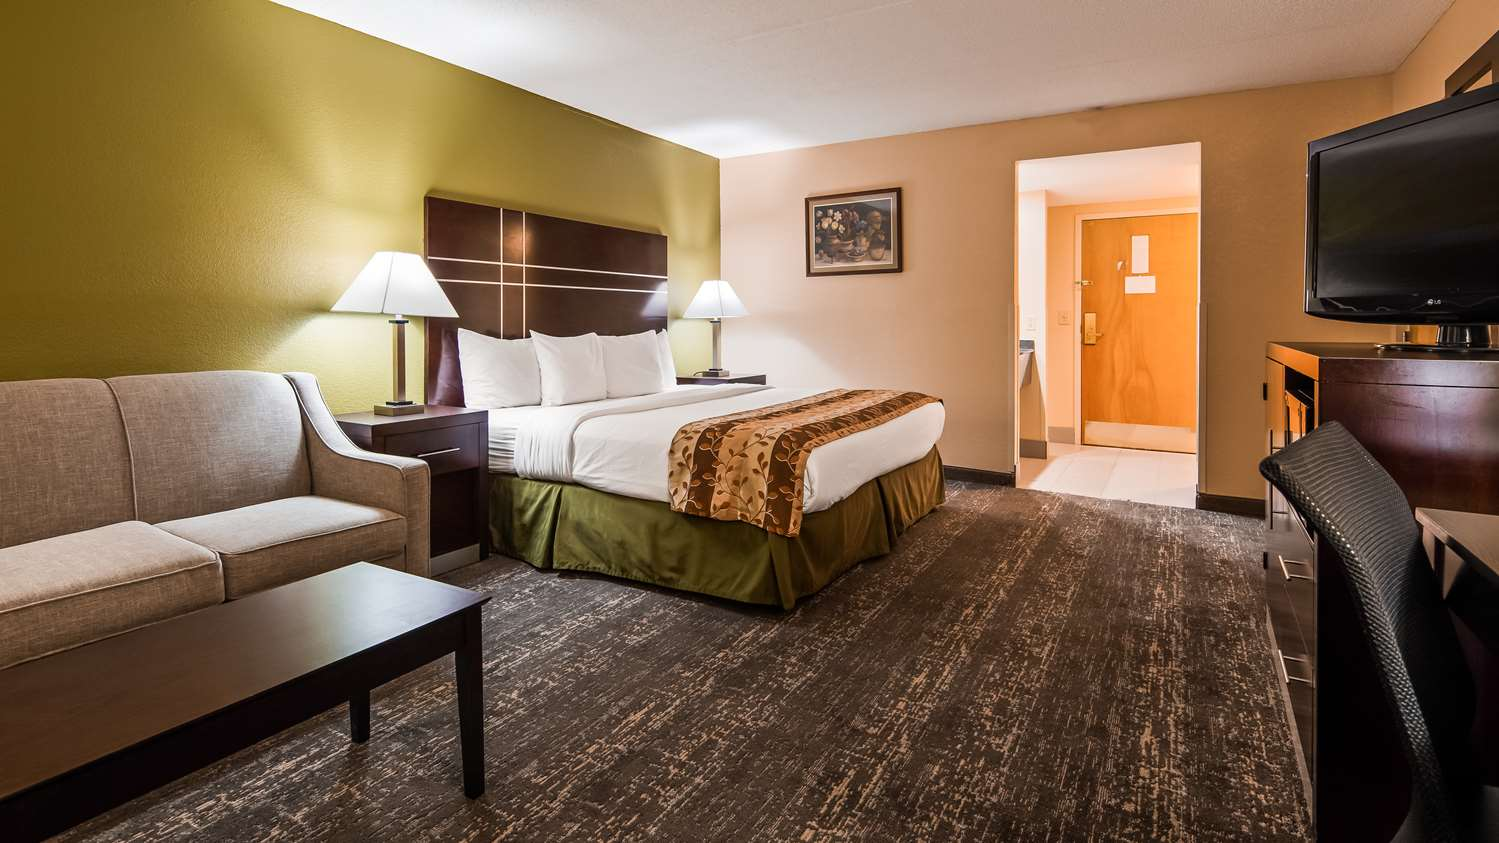 Hotels in Fort Wayne| Best Western Luxbury Inn Fort Wayne